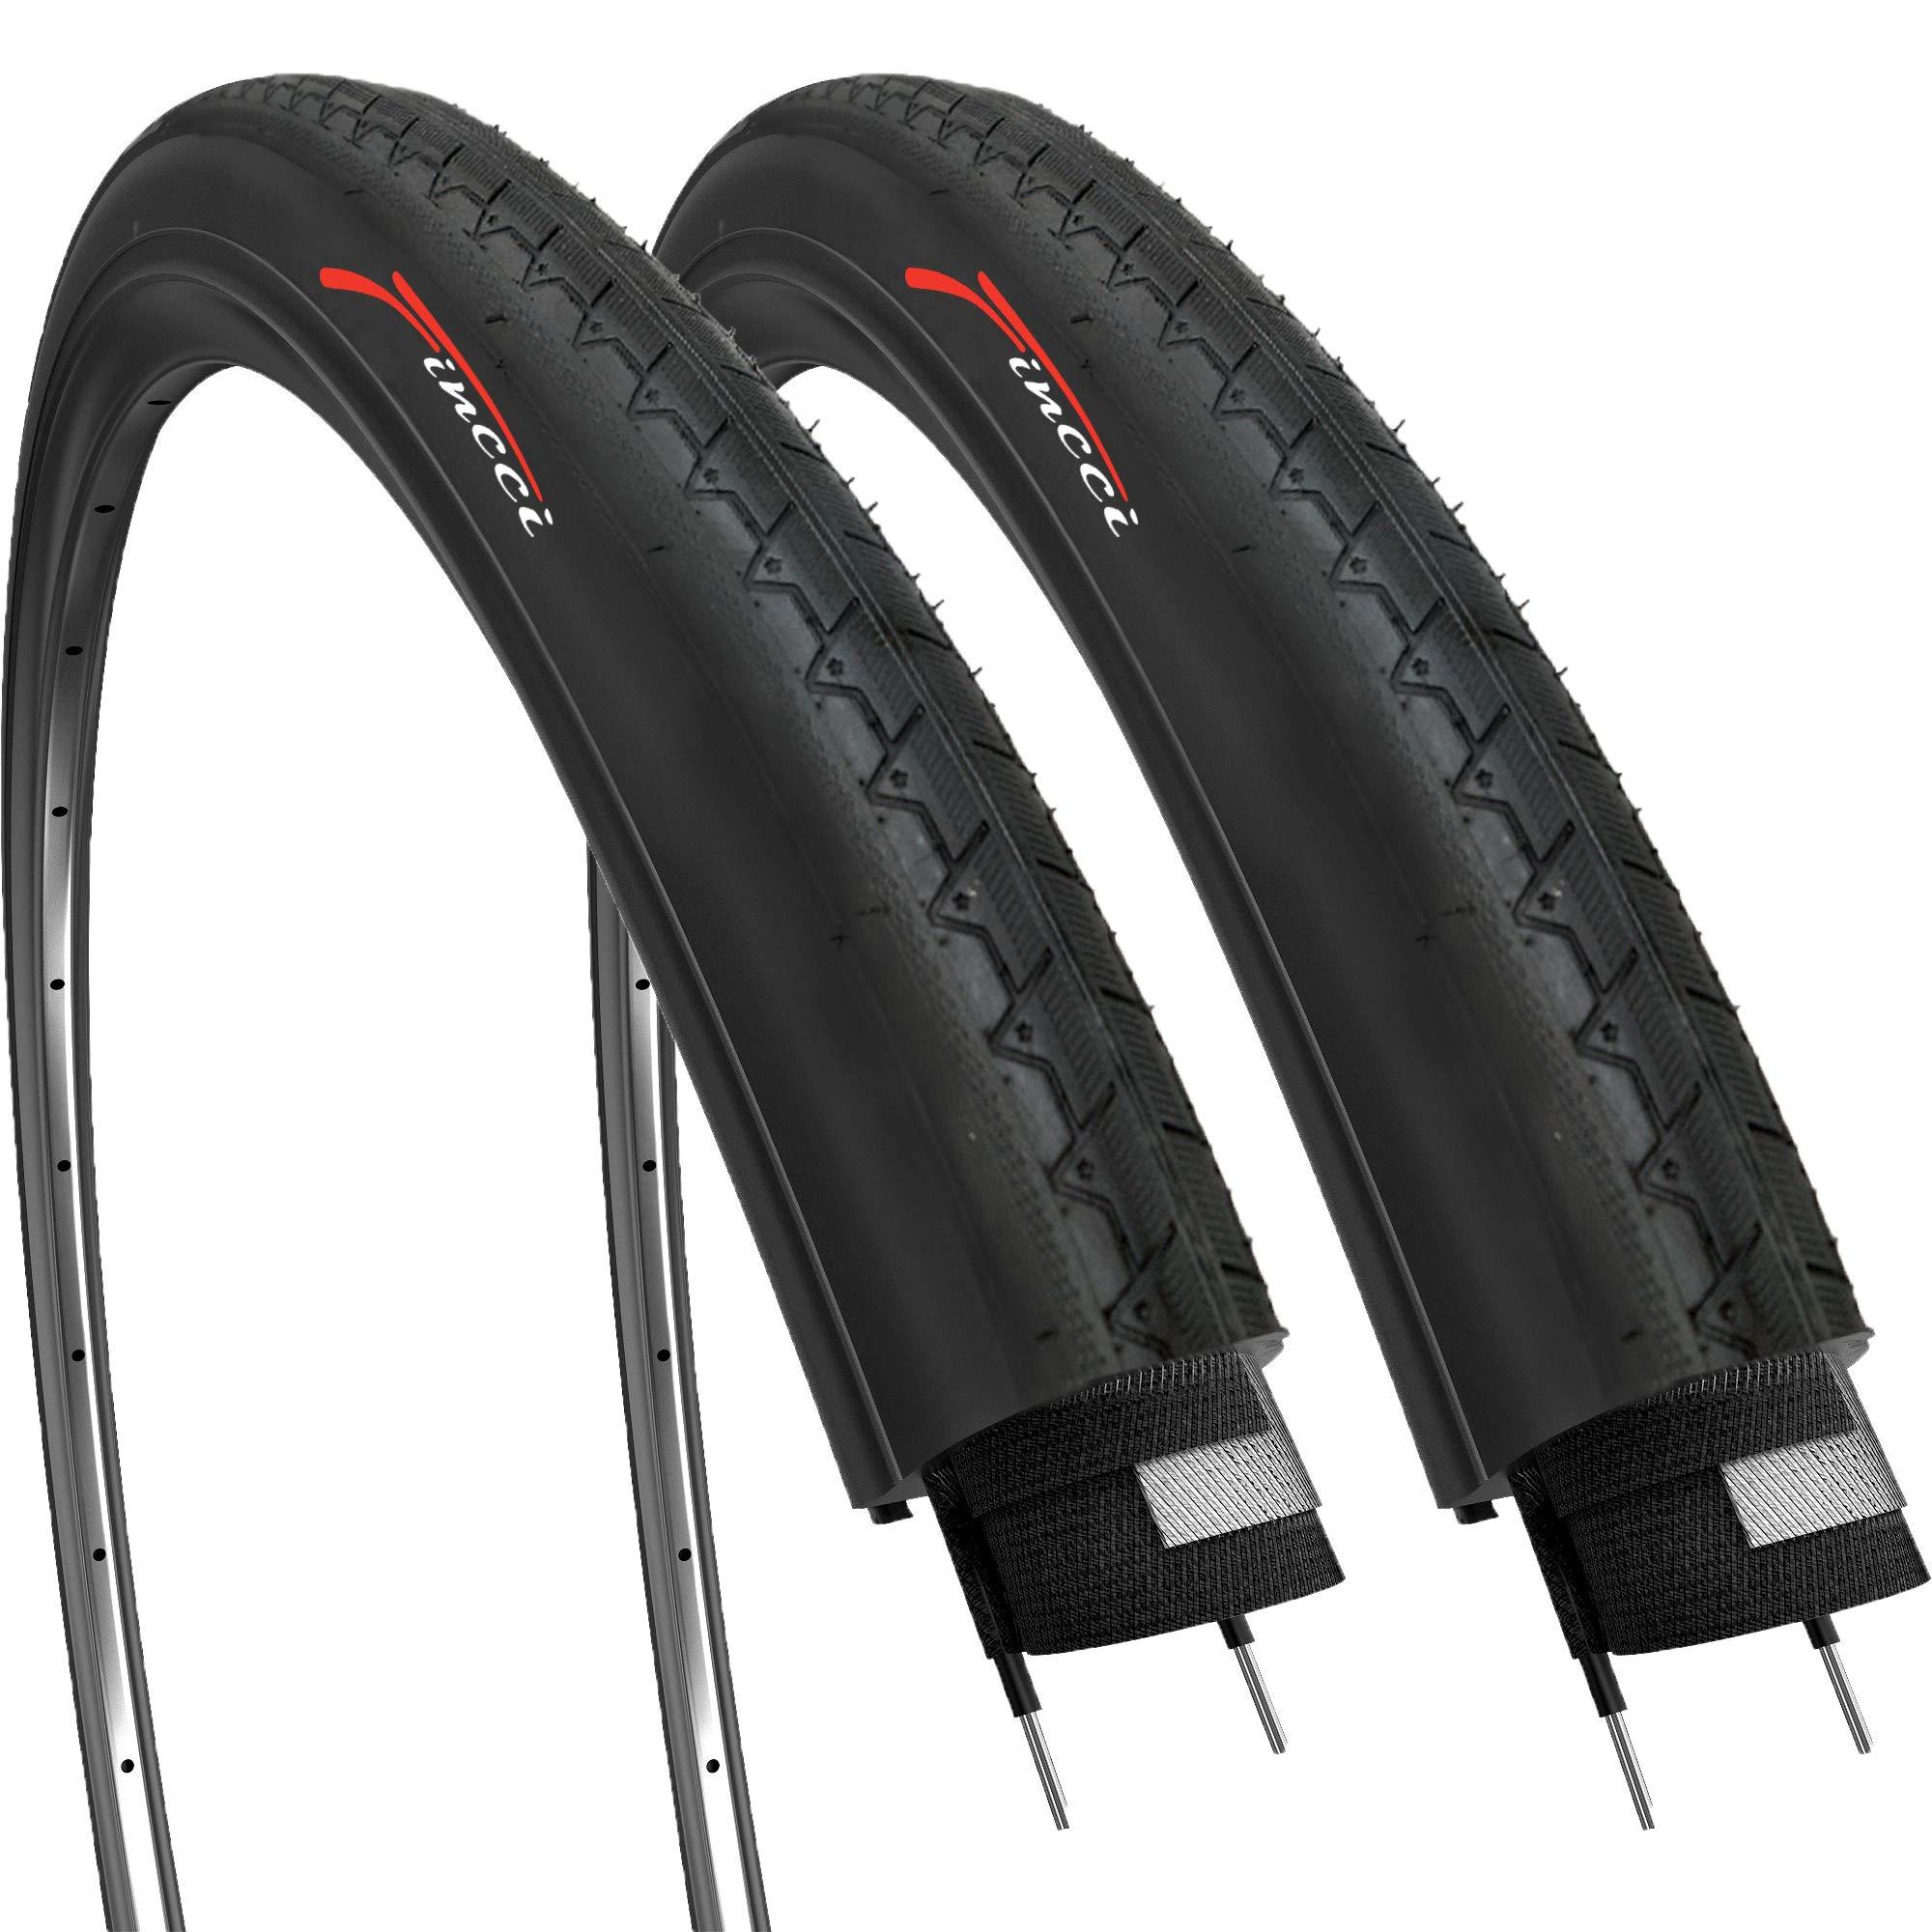 Fincci Par 700 x 28c 28-622 Cubiertas para Ciclo Carrera Carretera ...